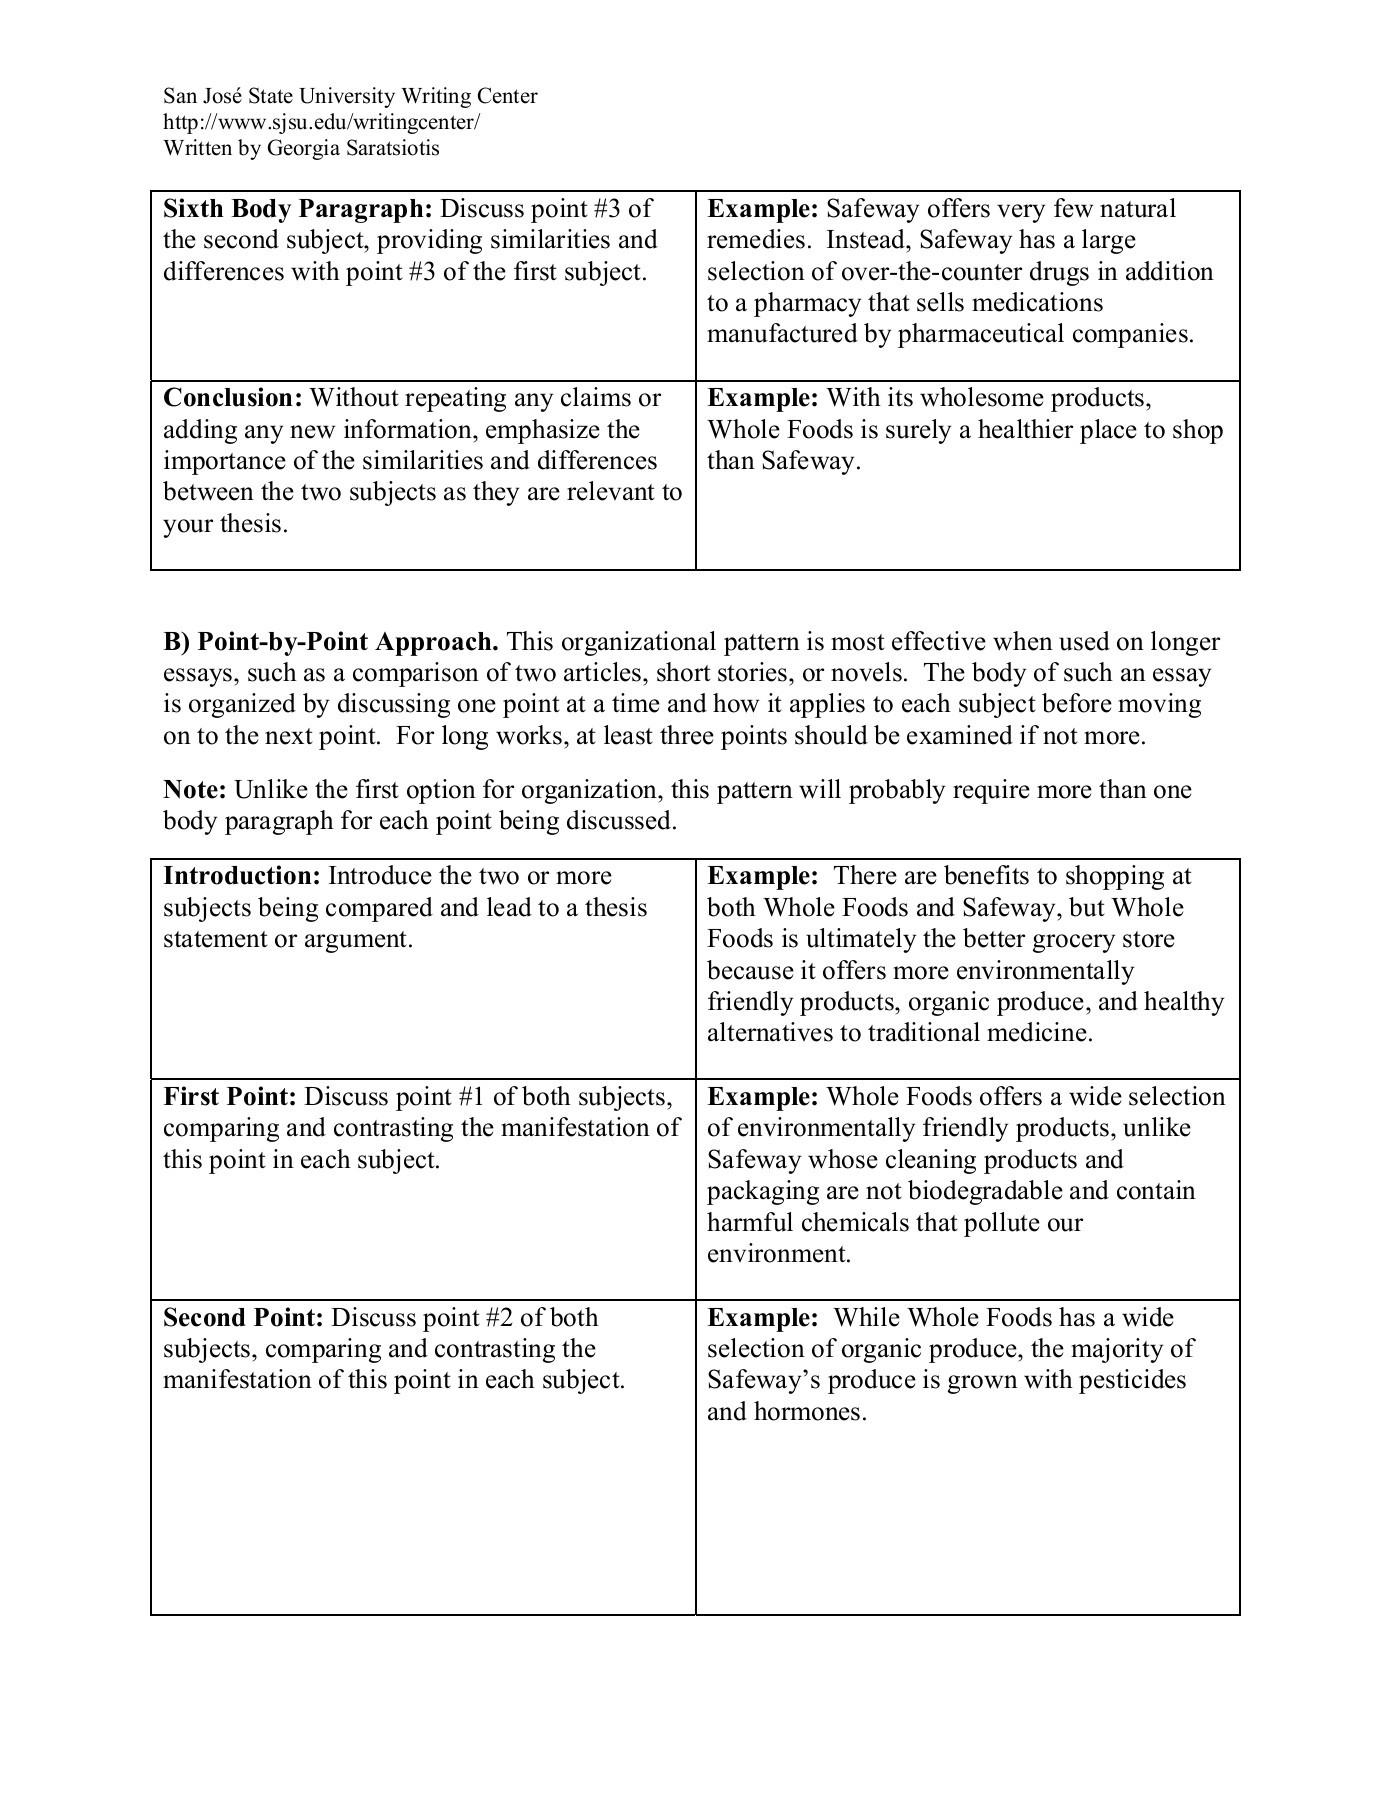 003 Comparison And Contrast Essayss Essay Ideas Maus